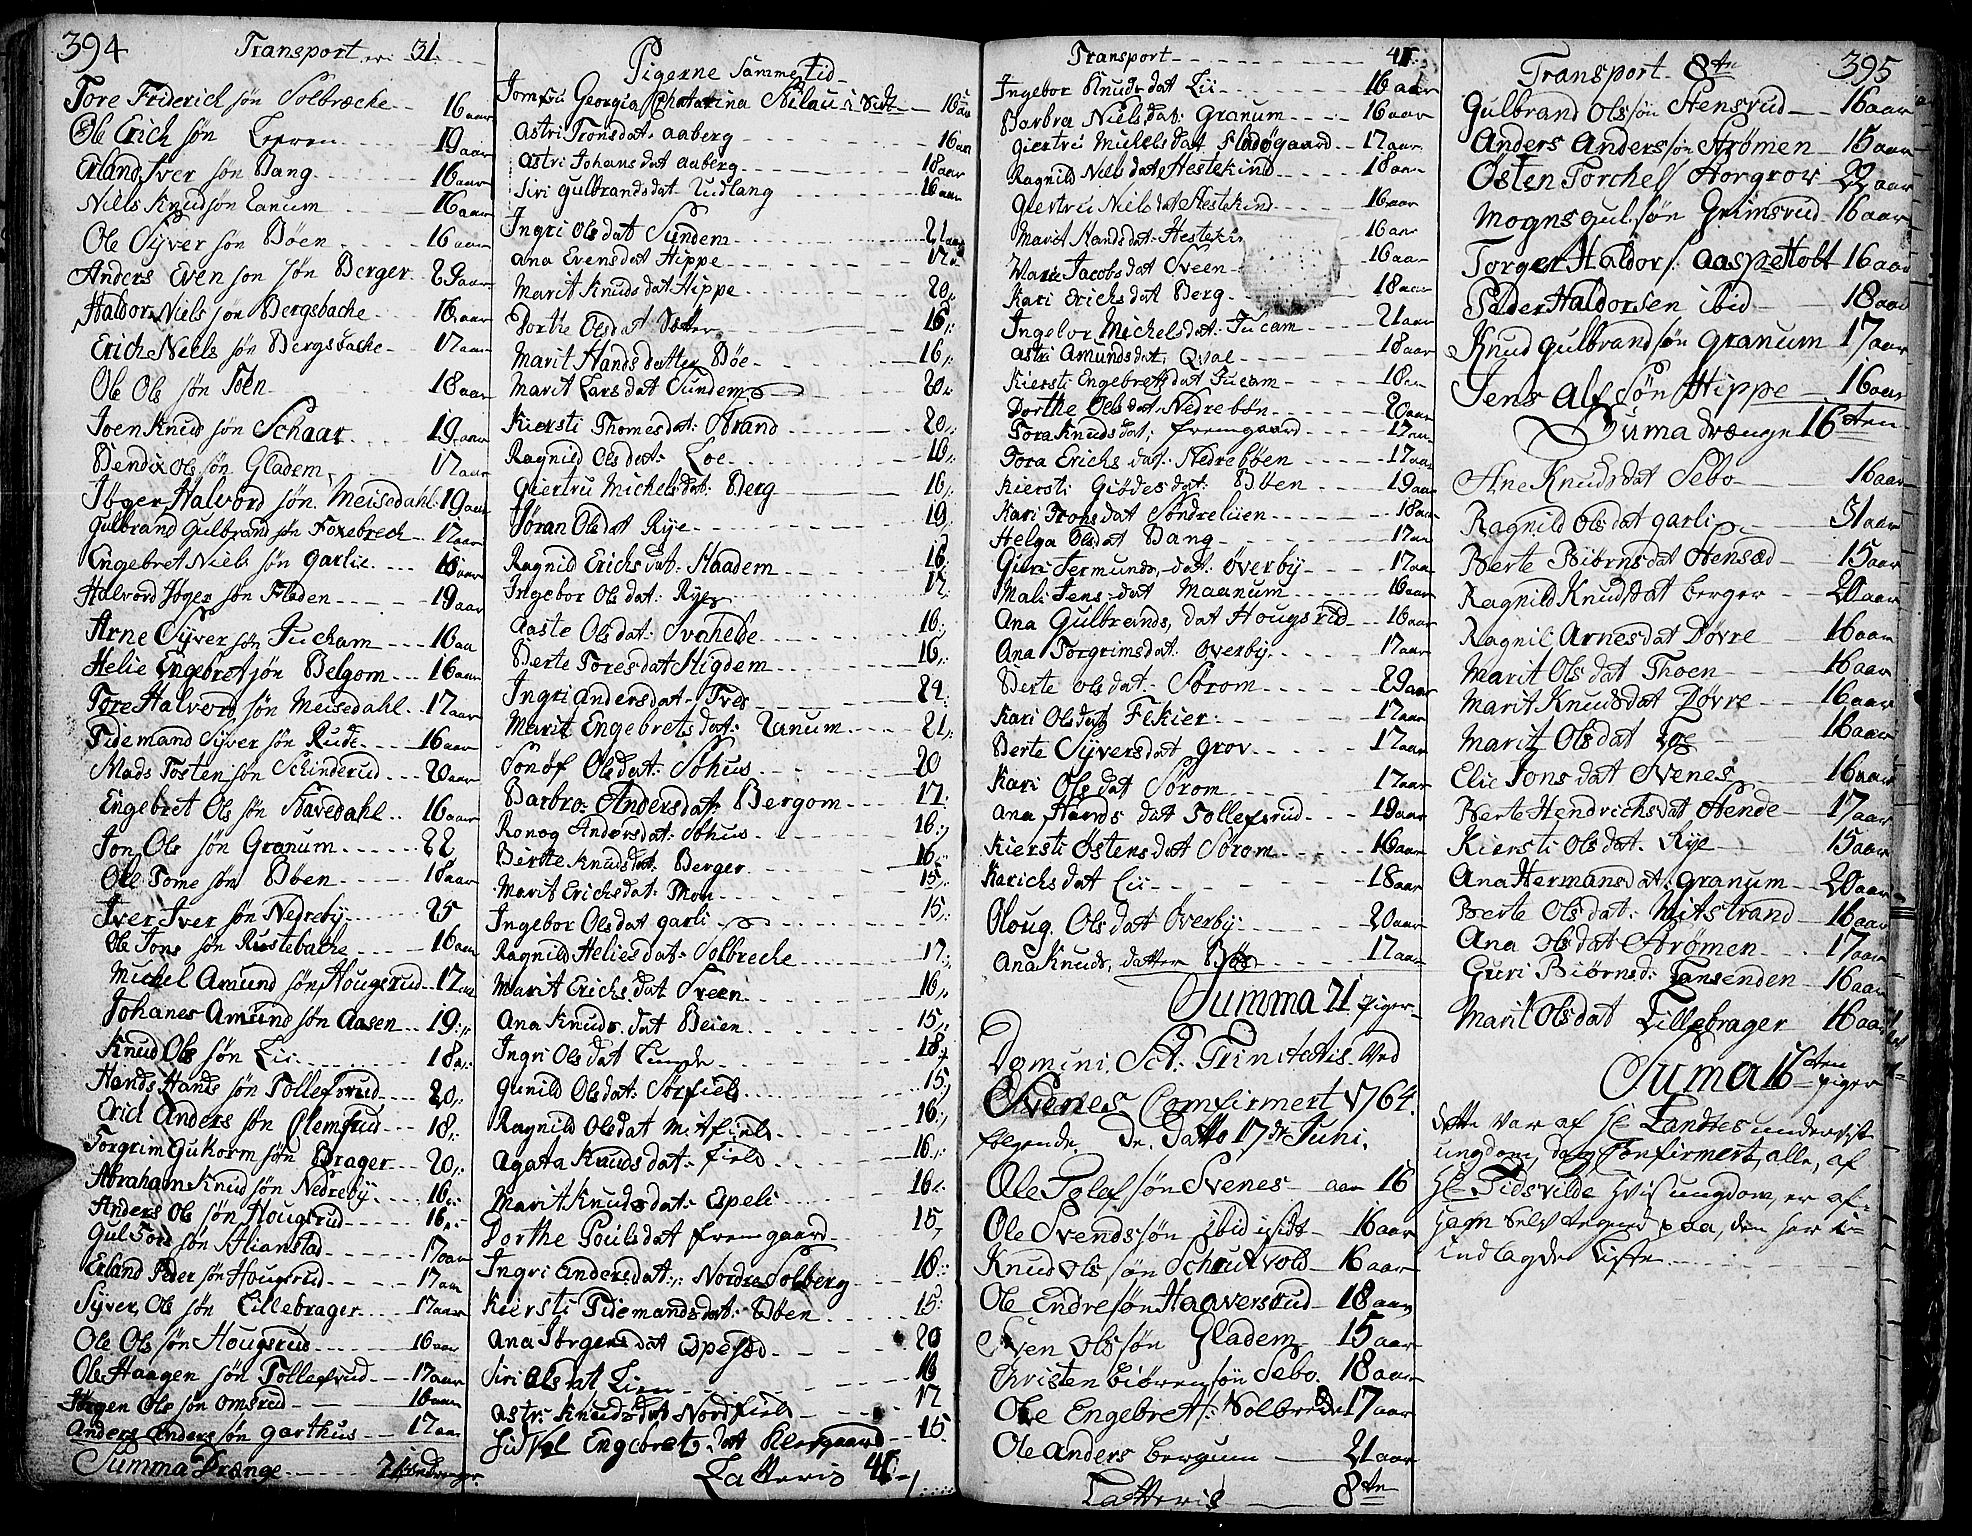 SAH, Aurdal prestekontor, Ministerialbok nr. 5, 1763-1781, s. 394-395